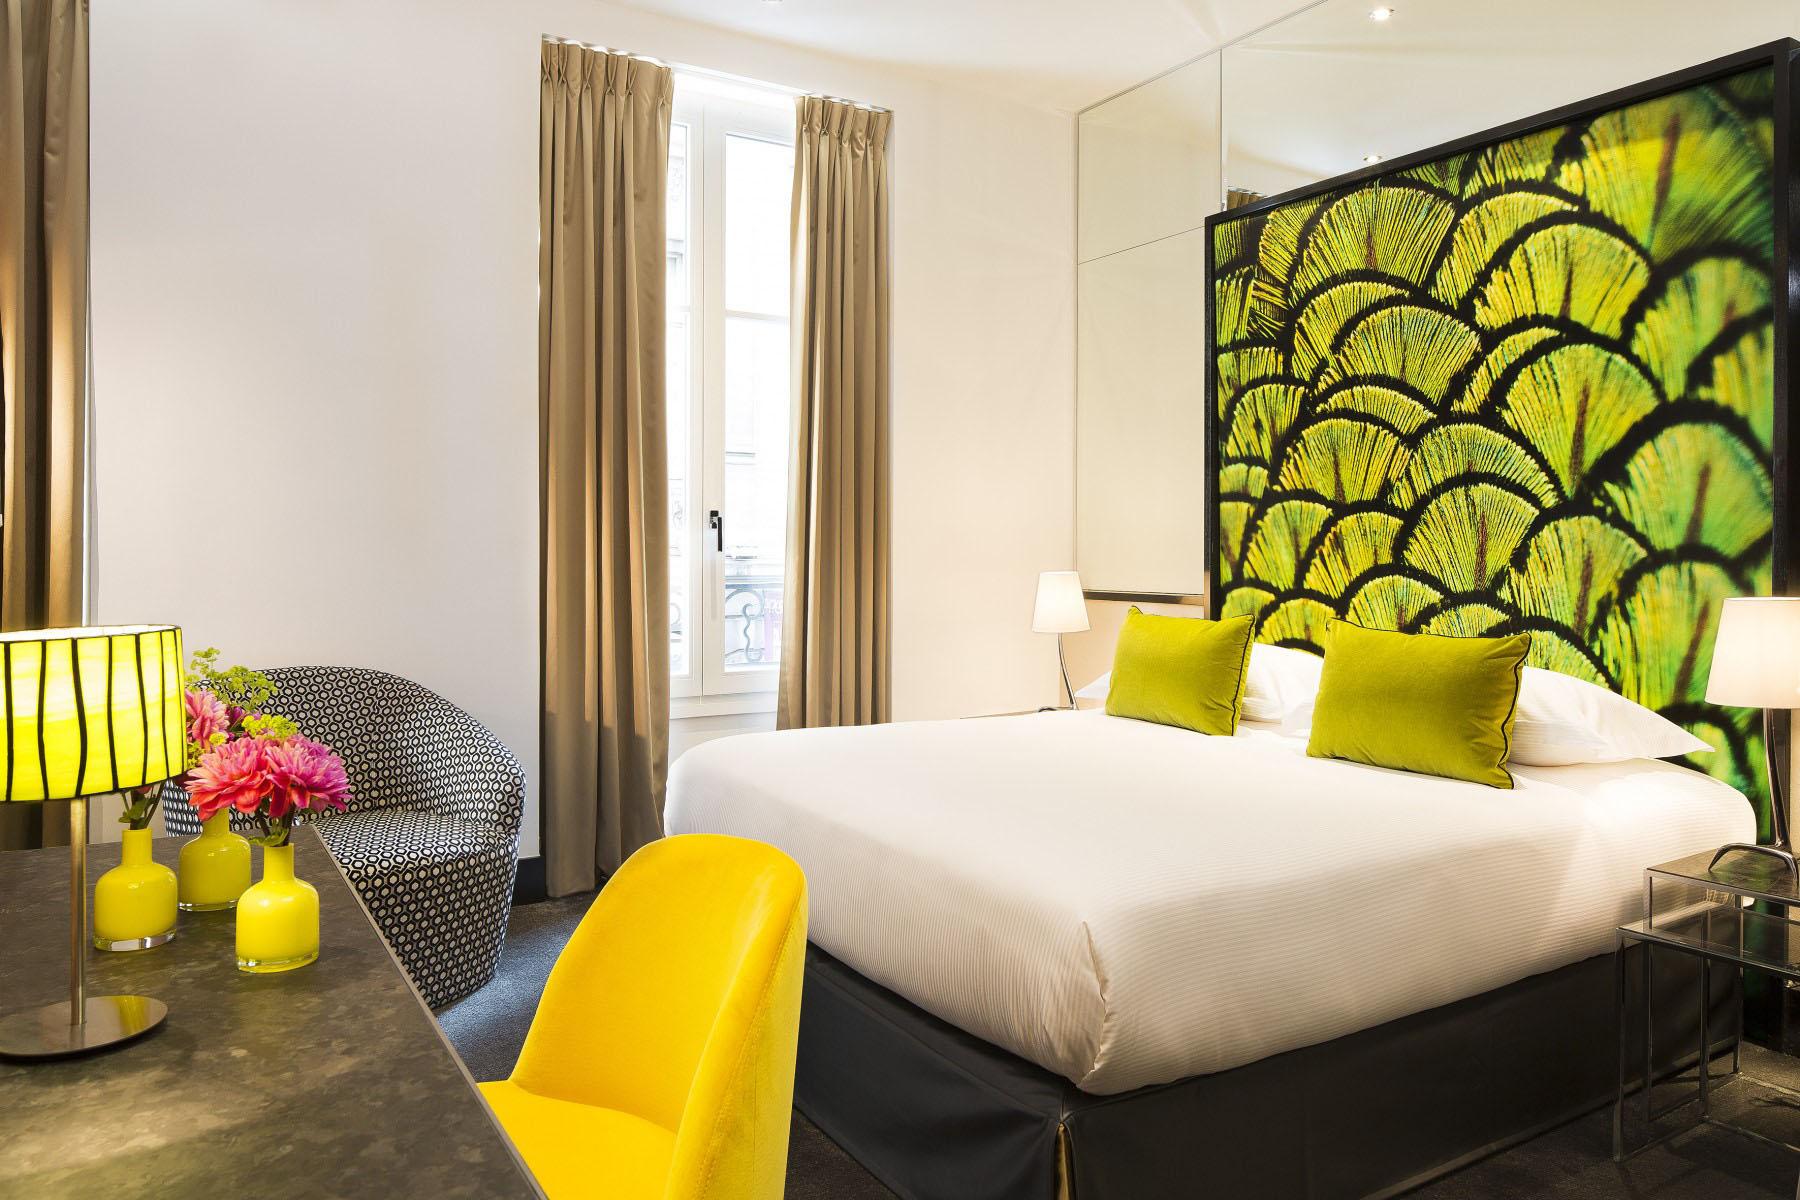 images of small decorated living rooms room set ashley furniture the elegant 4-star hôtel de sèze paris | idesignarch ...